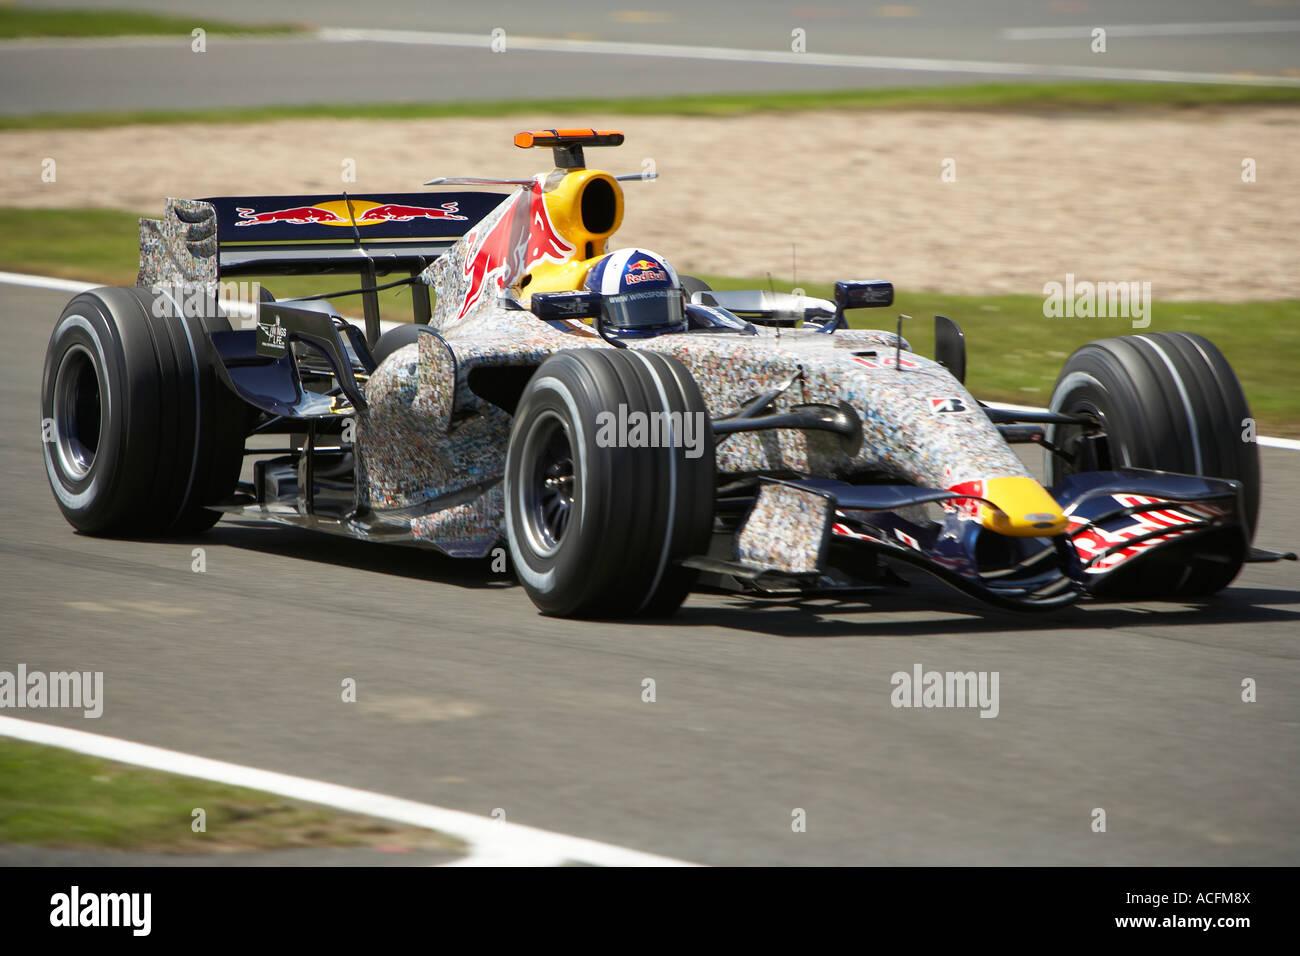 David Coulthard Driving His Red Bull Racing Forumla One Car At The British Grand Prix 2007